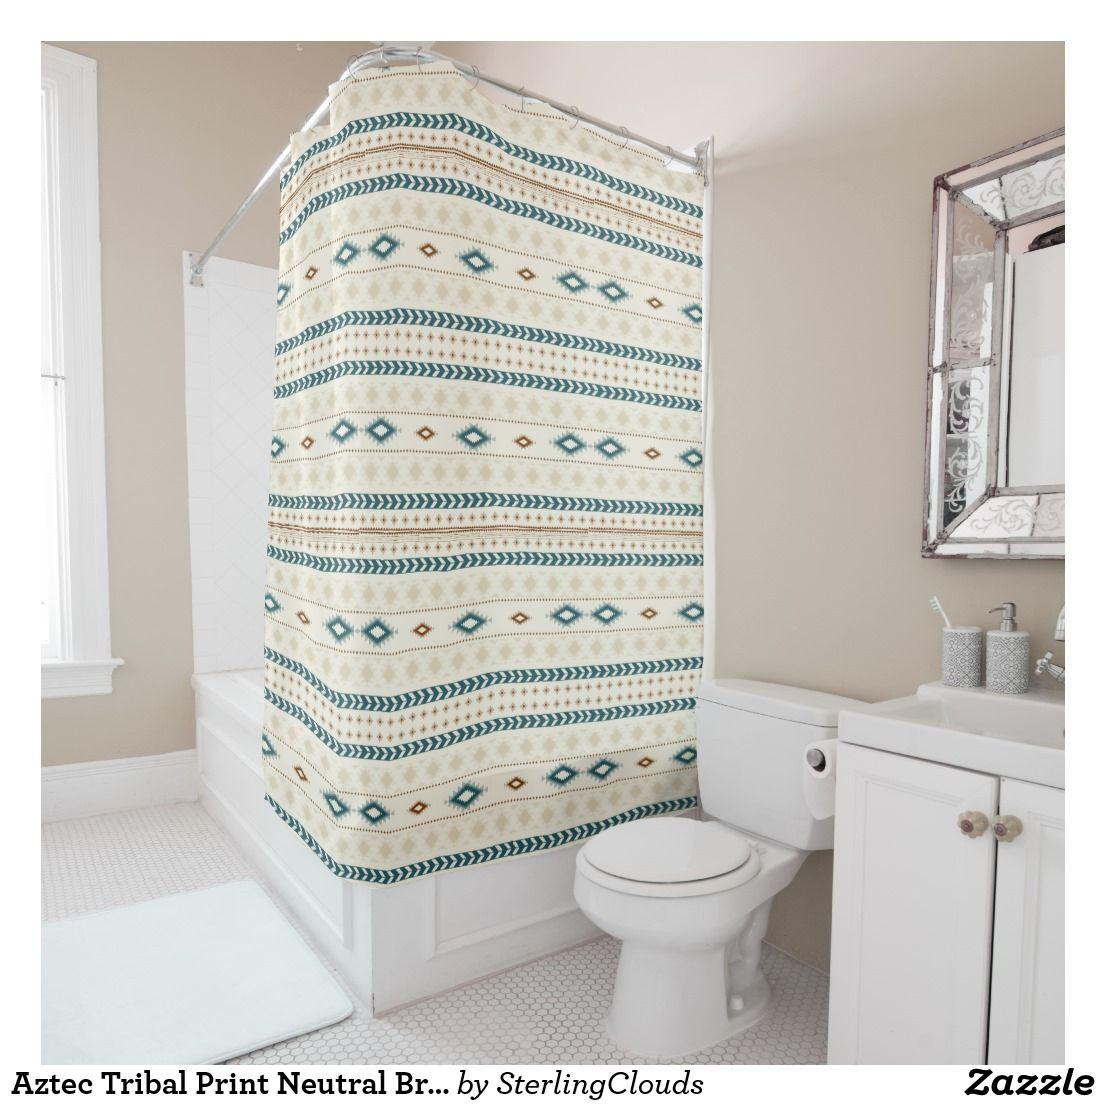 Aztec Tribal Print Neutral Browns Beige Teal Shower Curtain